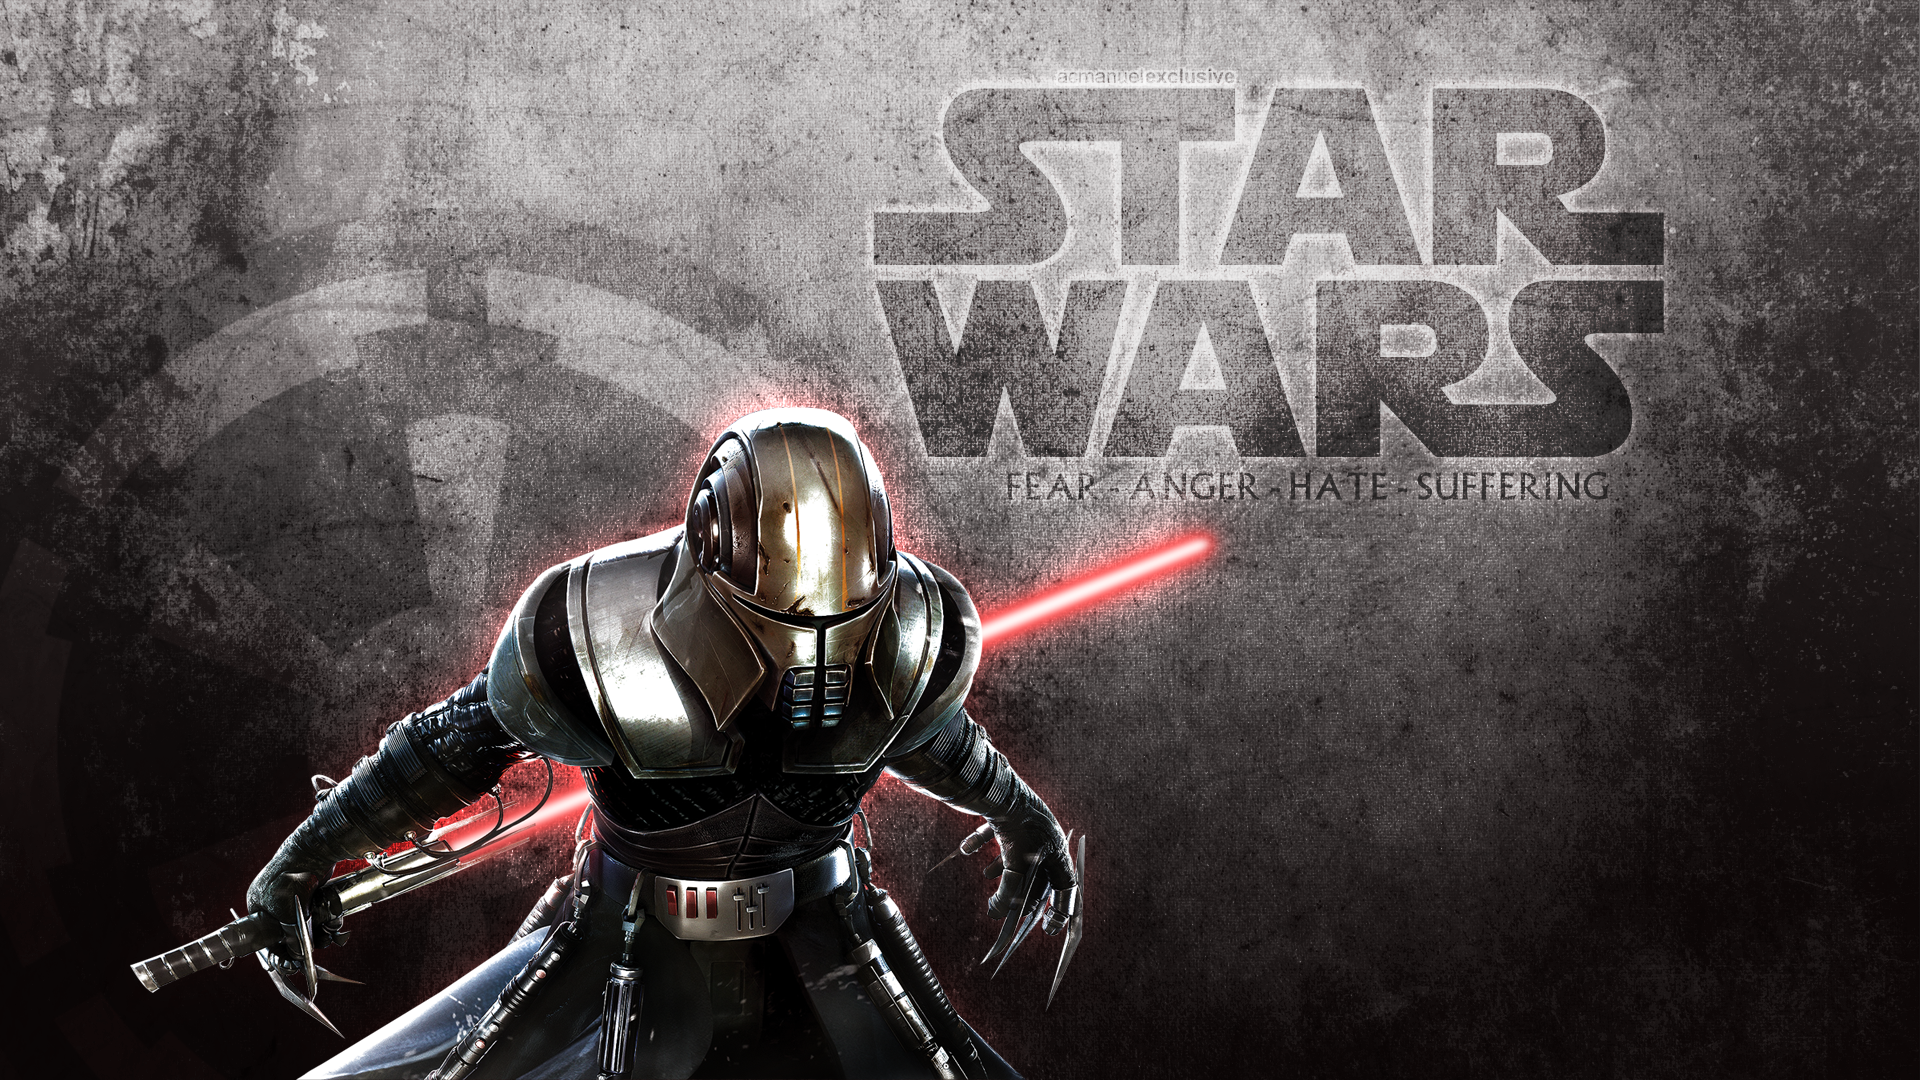 Sith Star Wars Wallpaper wallpaper   964582 1920x1080